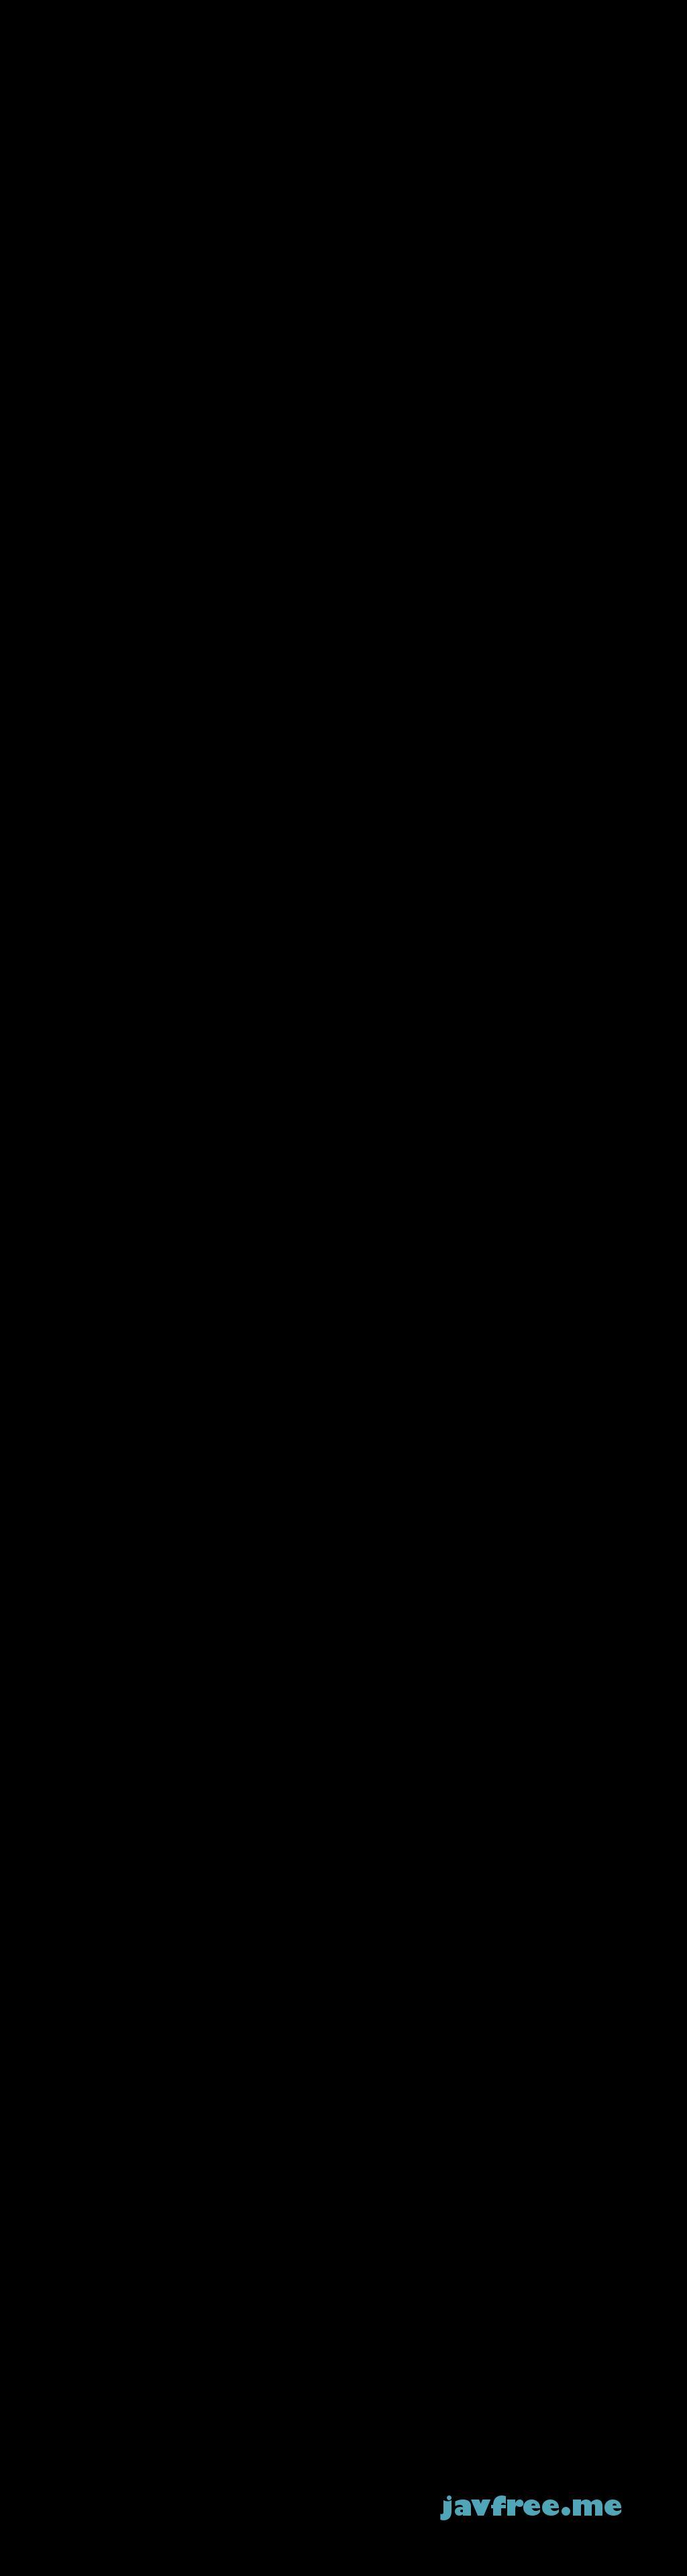 [AAJB-130] 【AV30】完全生涯保存版 永遠なる淫舞 美しき女神たち - image AAJB-130a on https://javfree.me